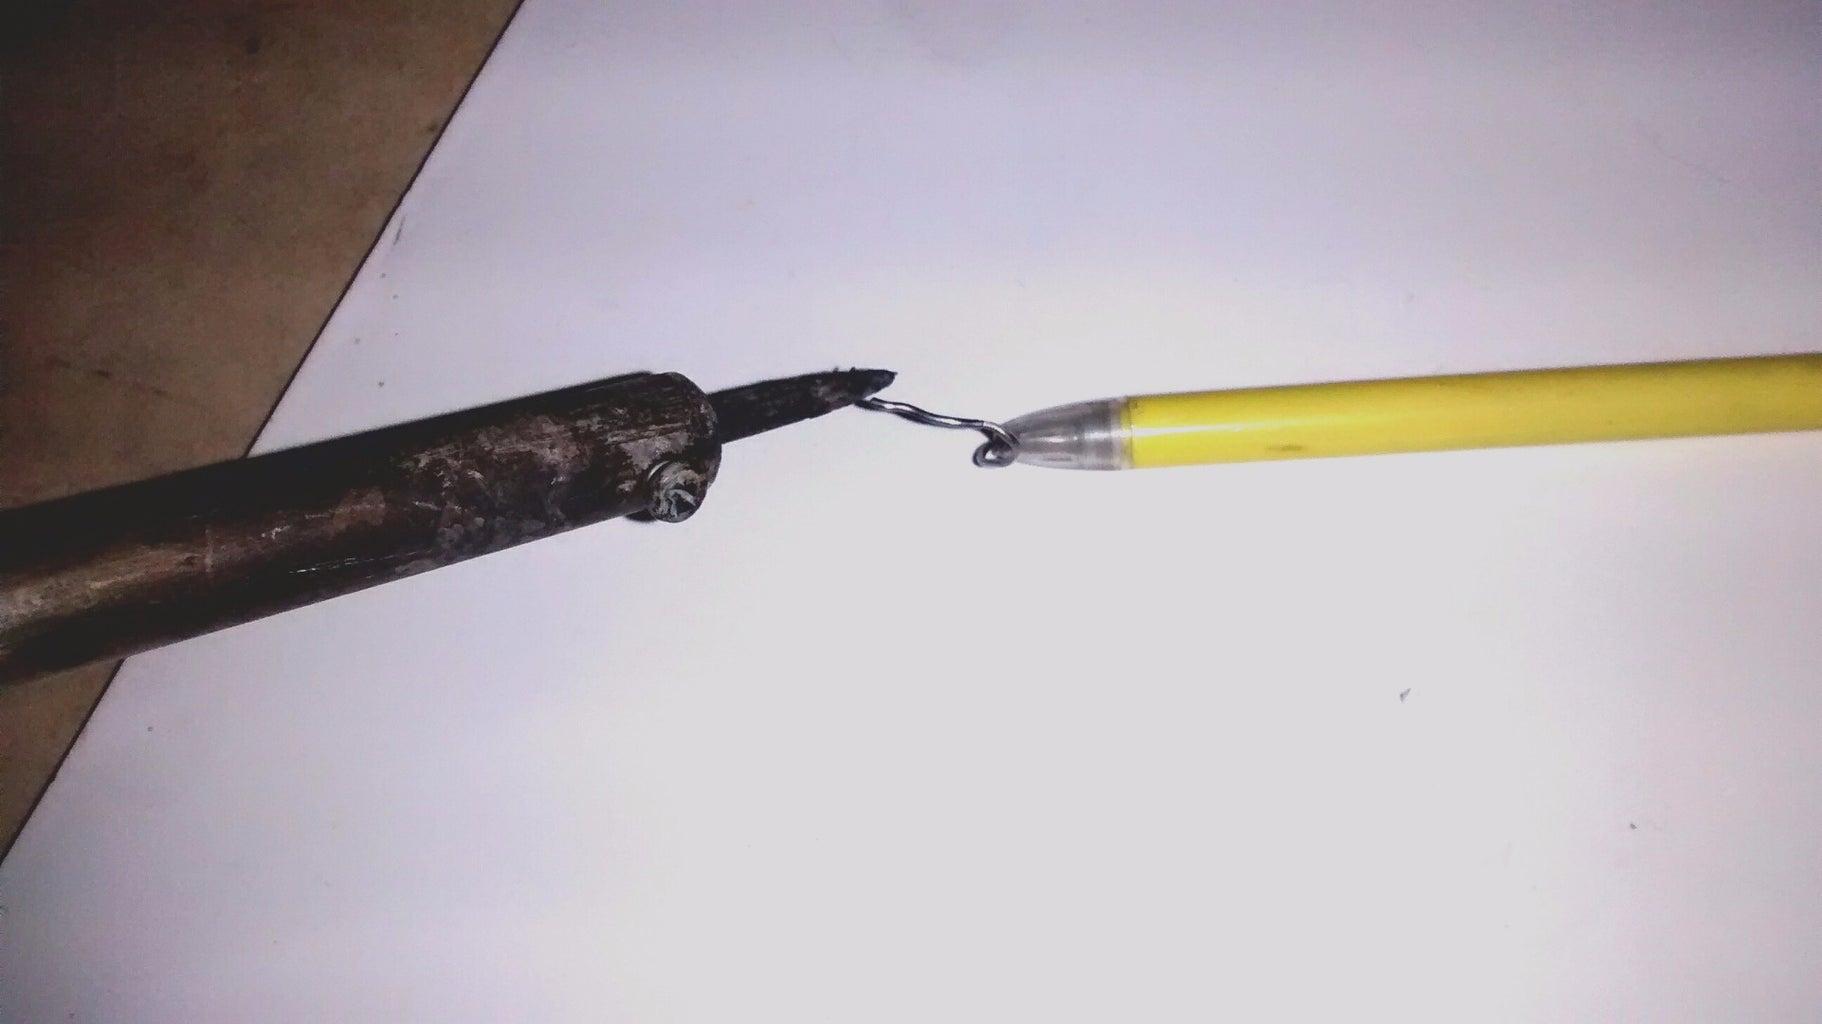 The Solder Pencil?!?